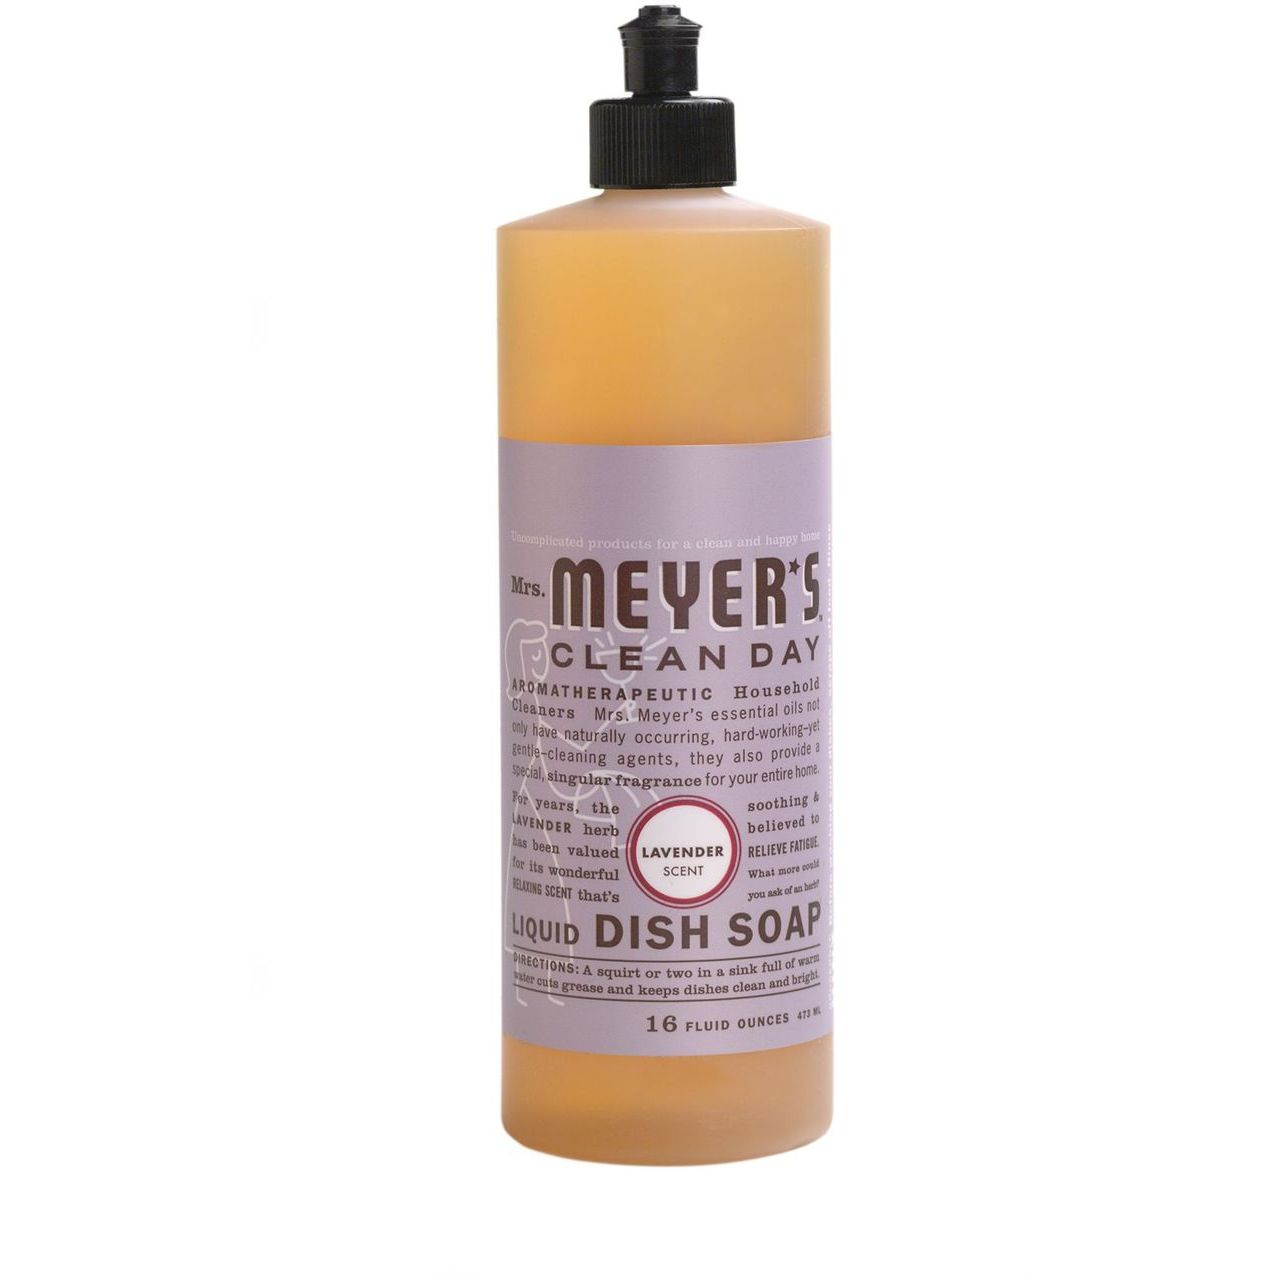 Caldrea 16 oz Lavander Clean Day Liquid Dish Soap